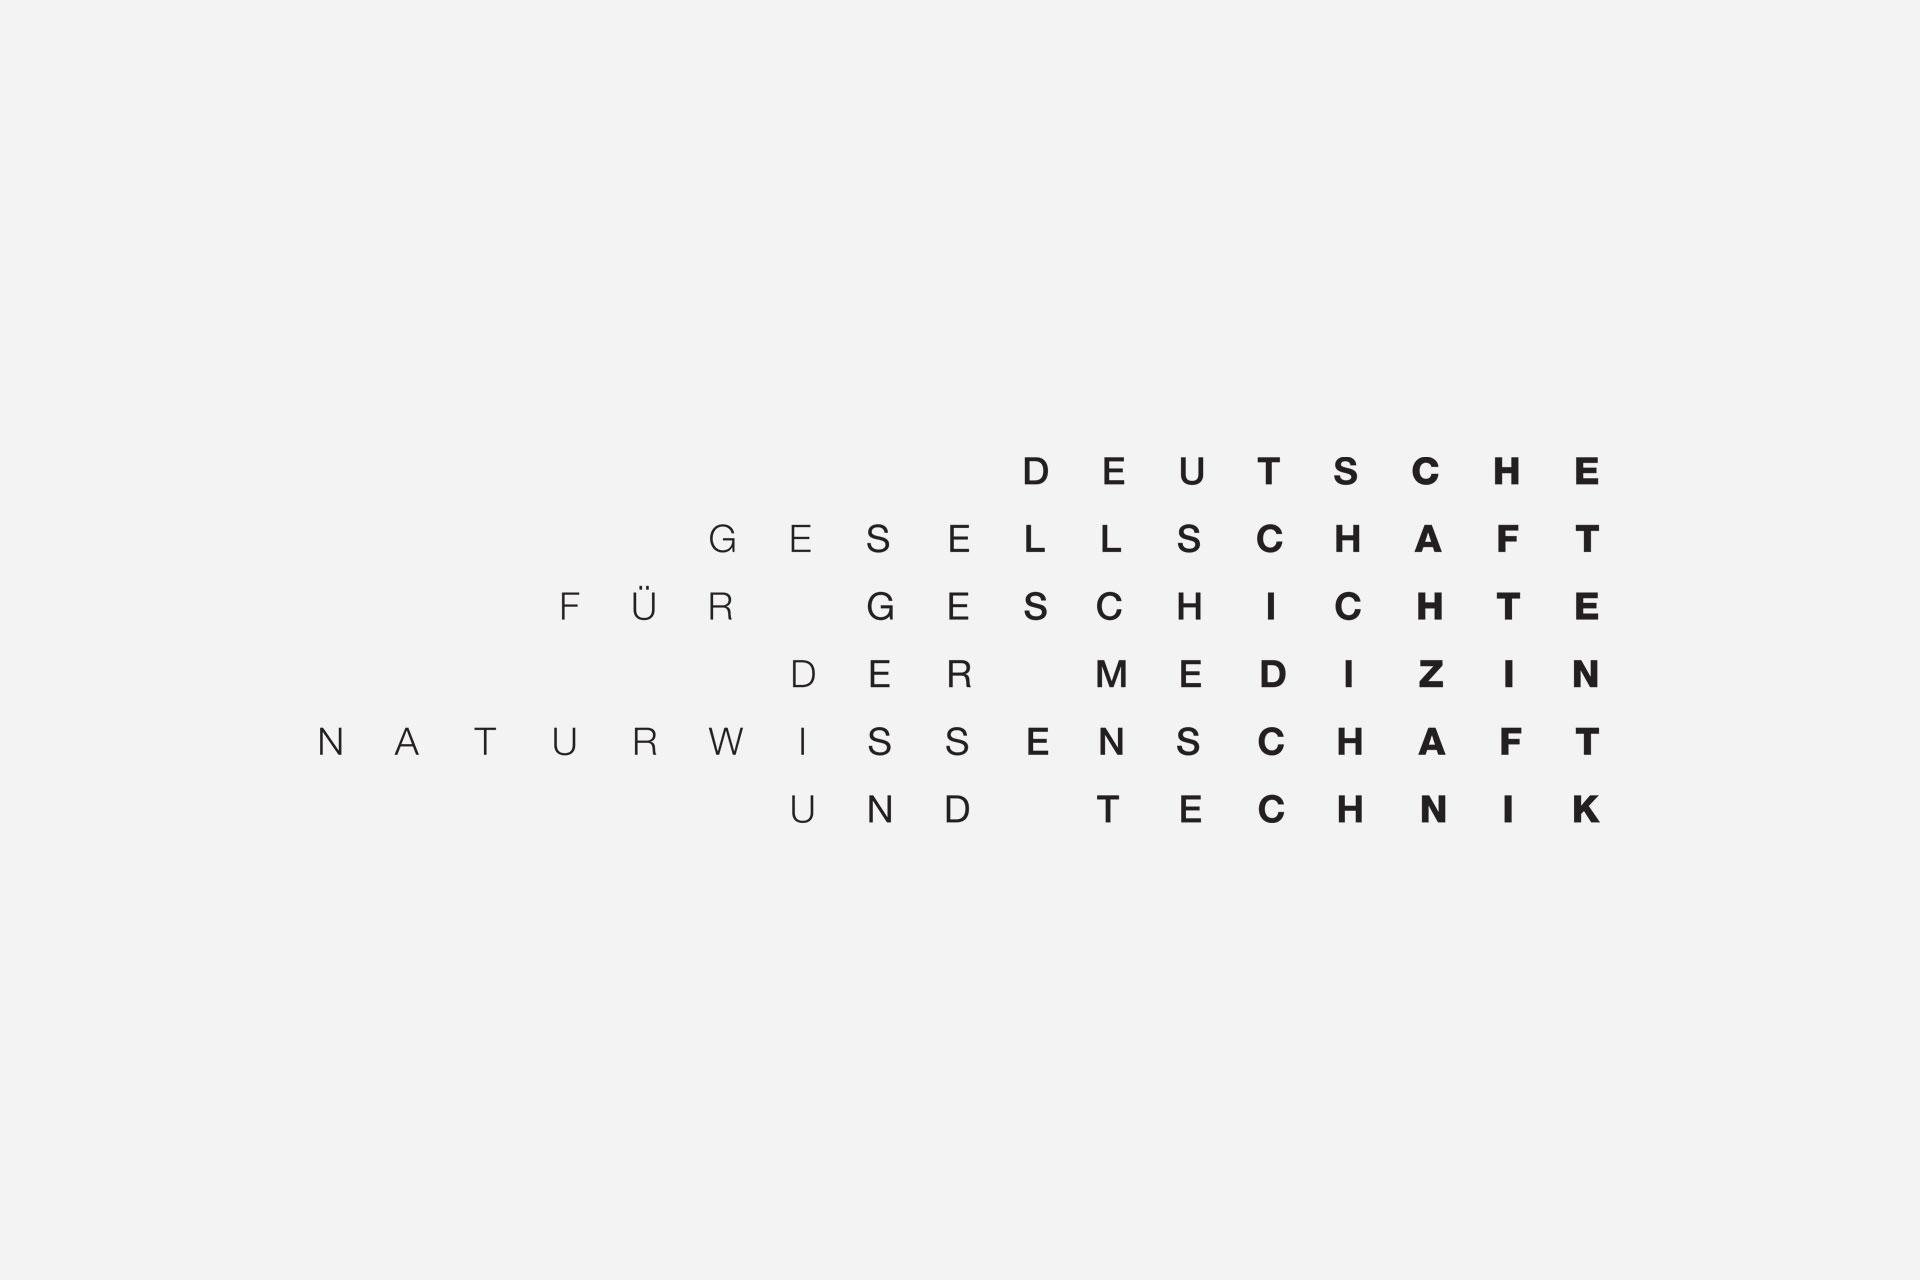 DGGMNT_nhe-mli_logo_01